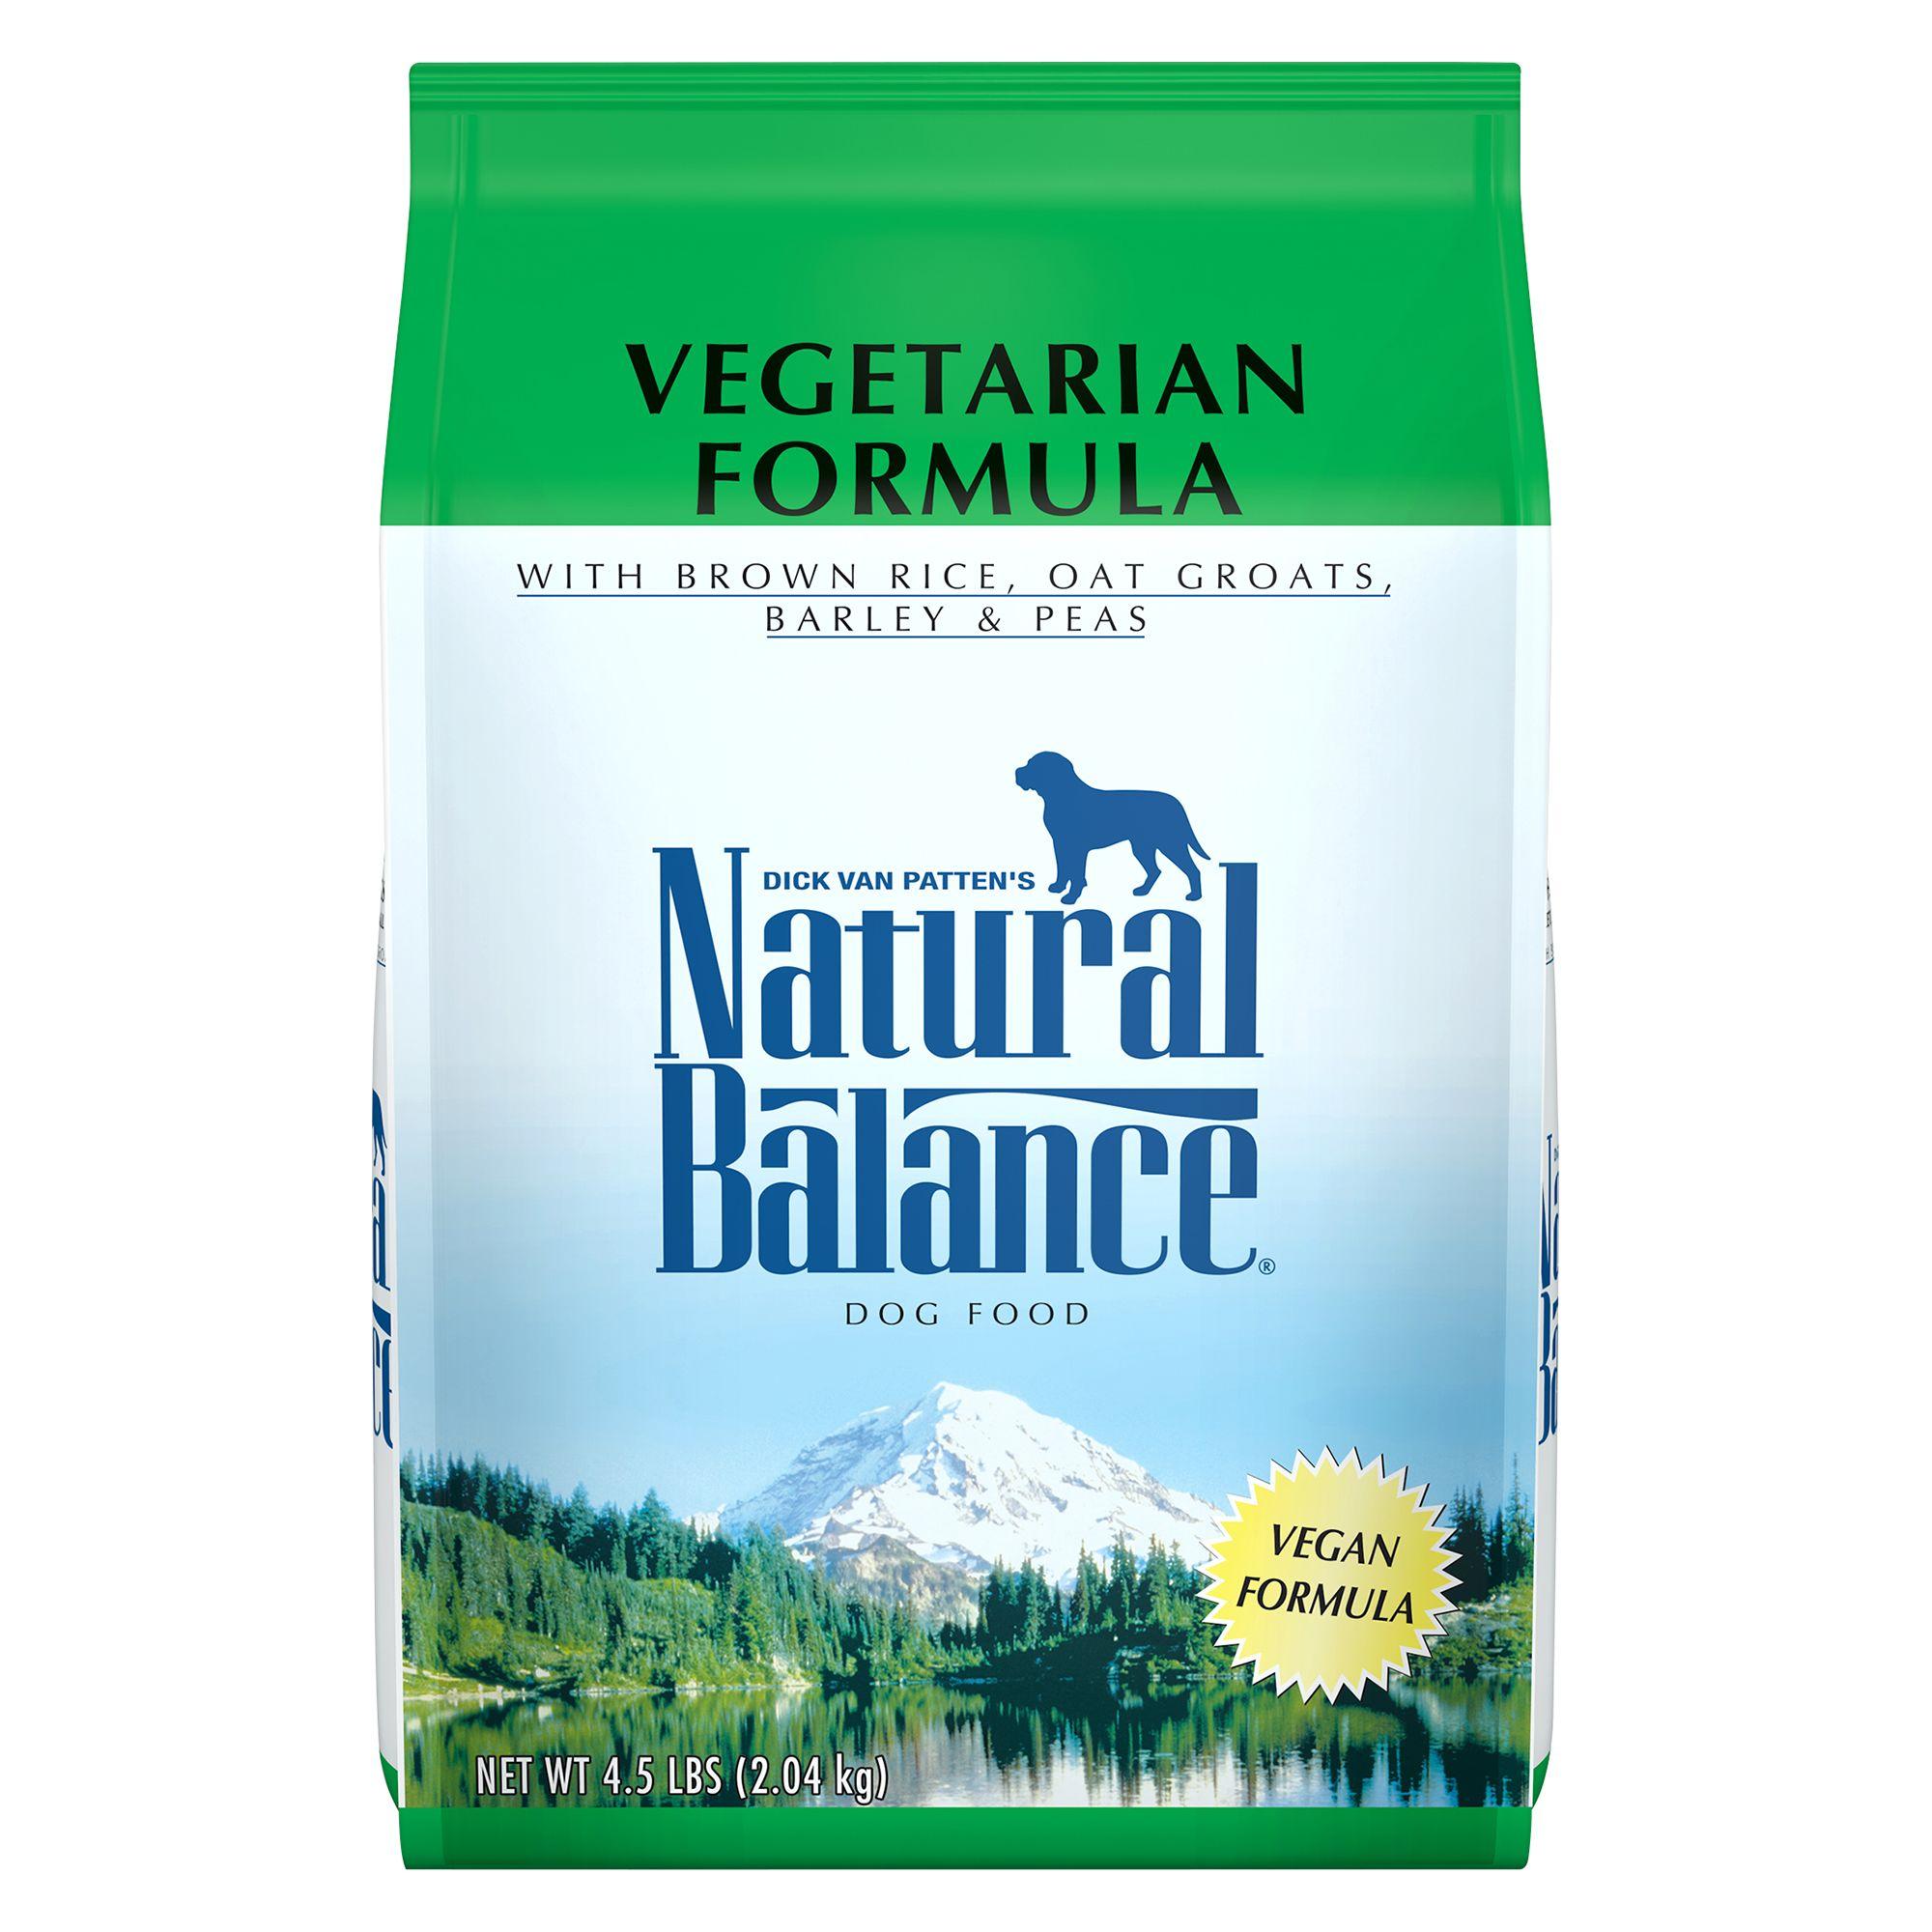 Natural Balance Dog Food Vegetarian Vegan